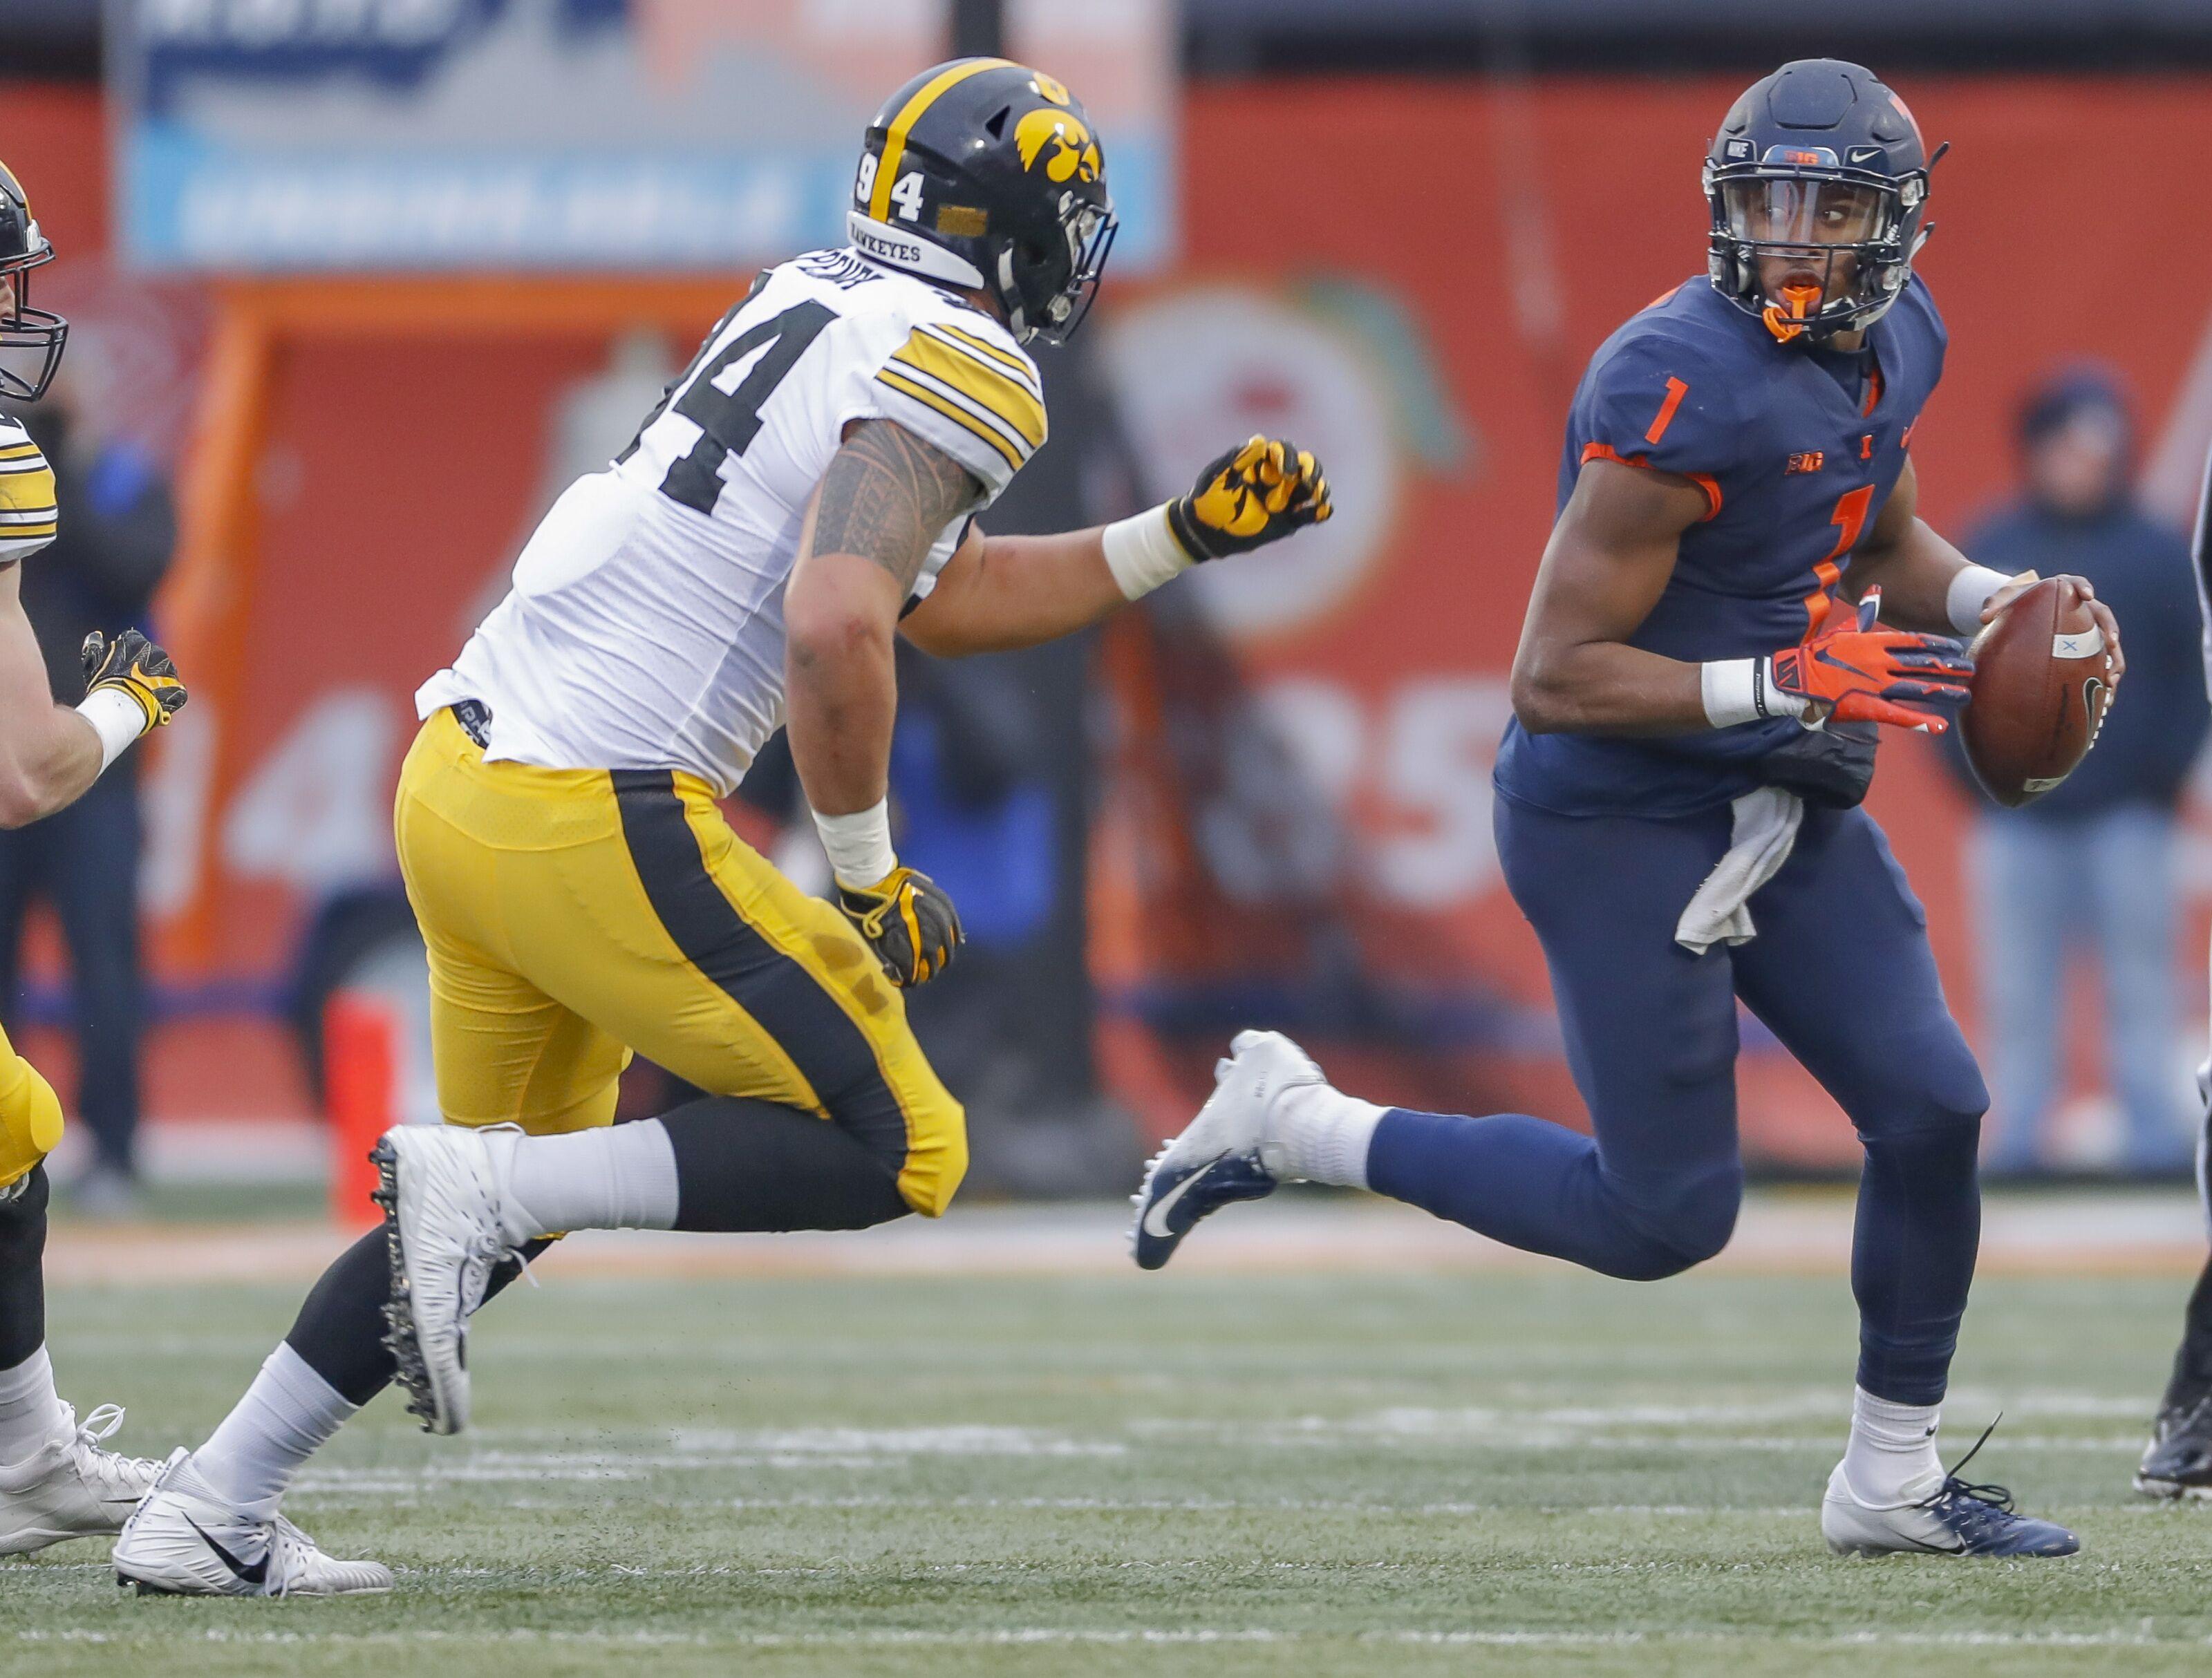 Iowa football: AJ Epenesa could break single-season sack record